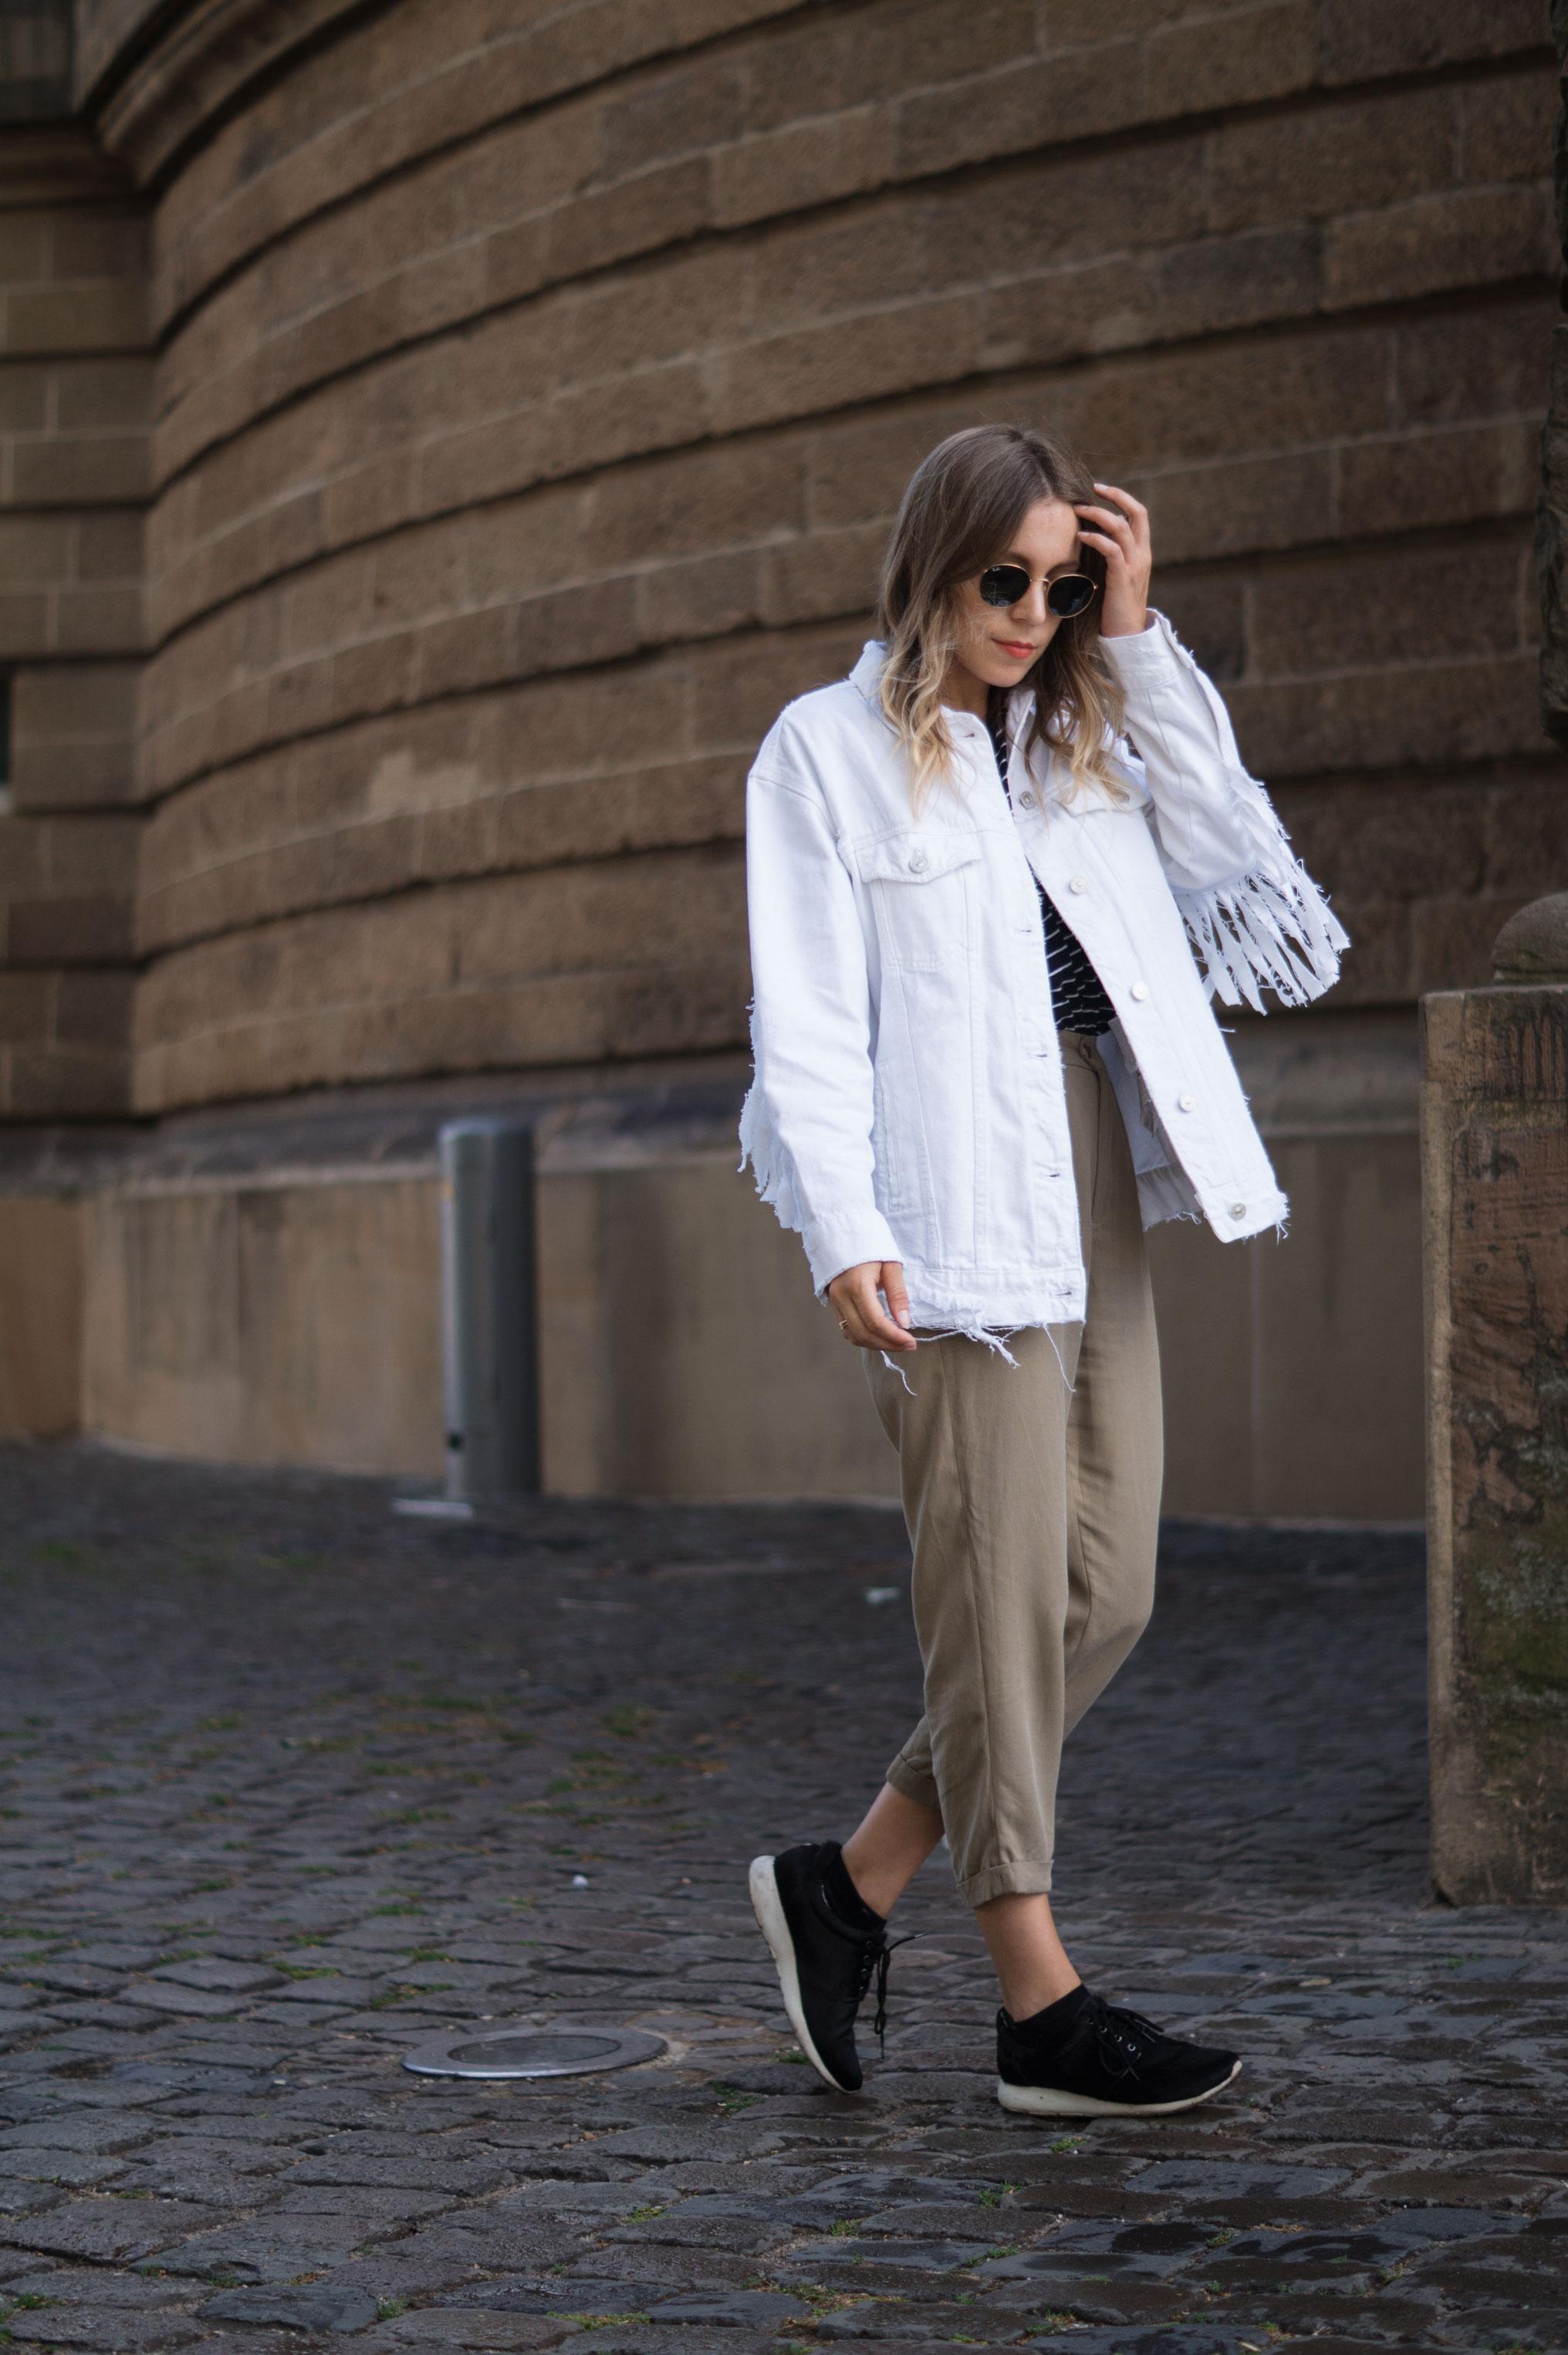 Fringed Denim Jacket Fransenjacke weiße Jeansjacke Casual Outfit Sariety Fashionblogger Modeblog Heidelberg Mannheim Wasserturm-1